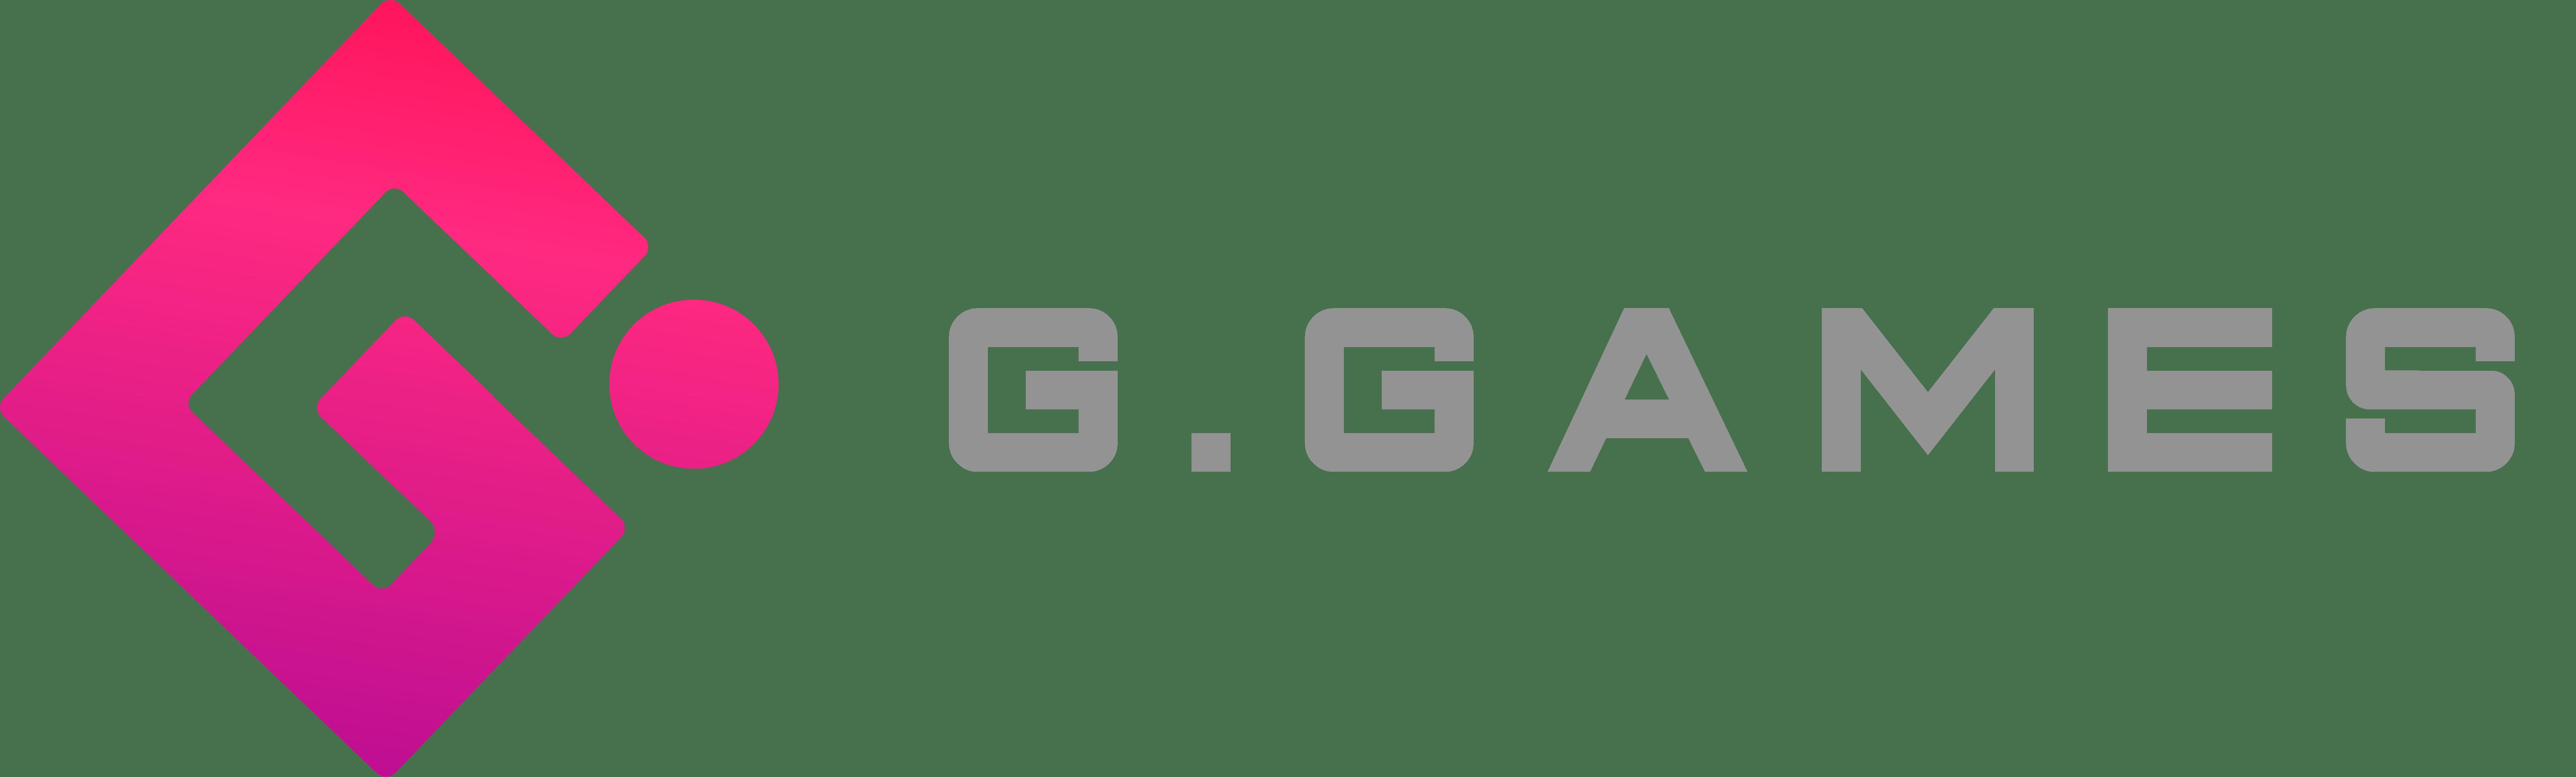 G. Games (Former Gamevy) juegos